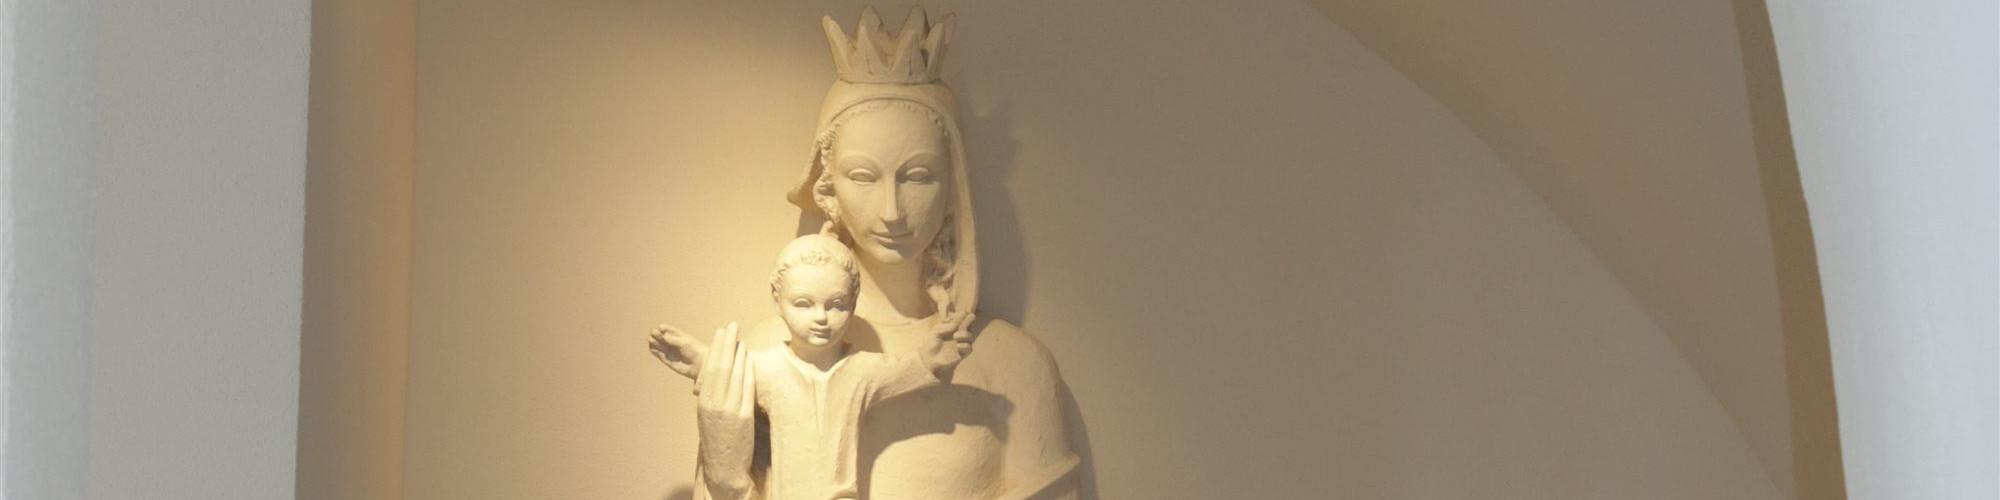 Niederwerrn Marienfigur-sld